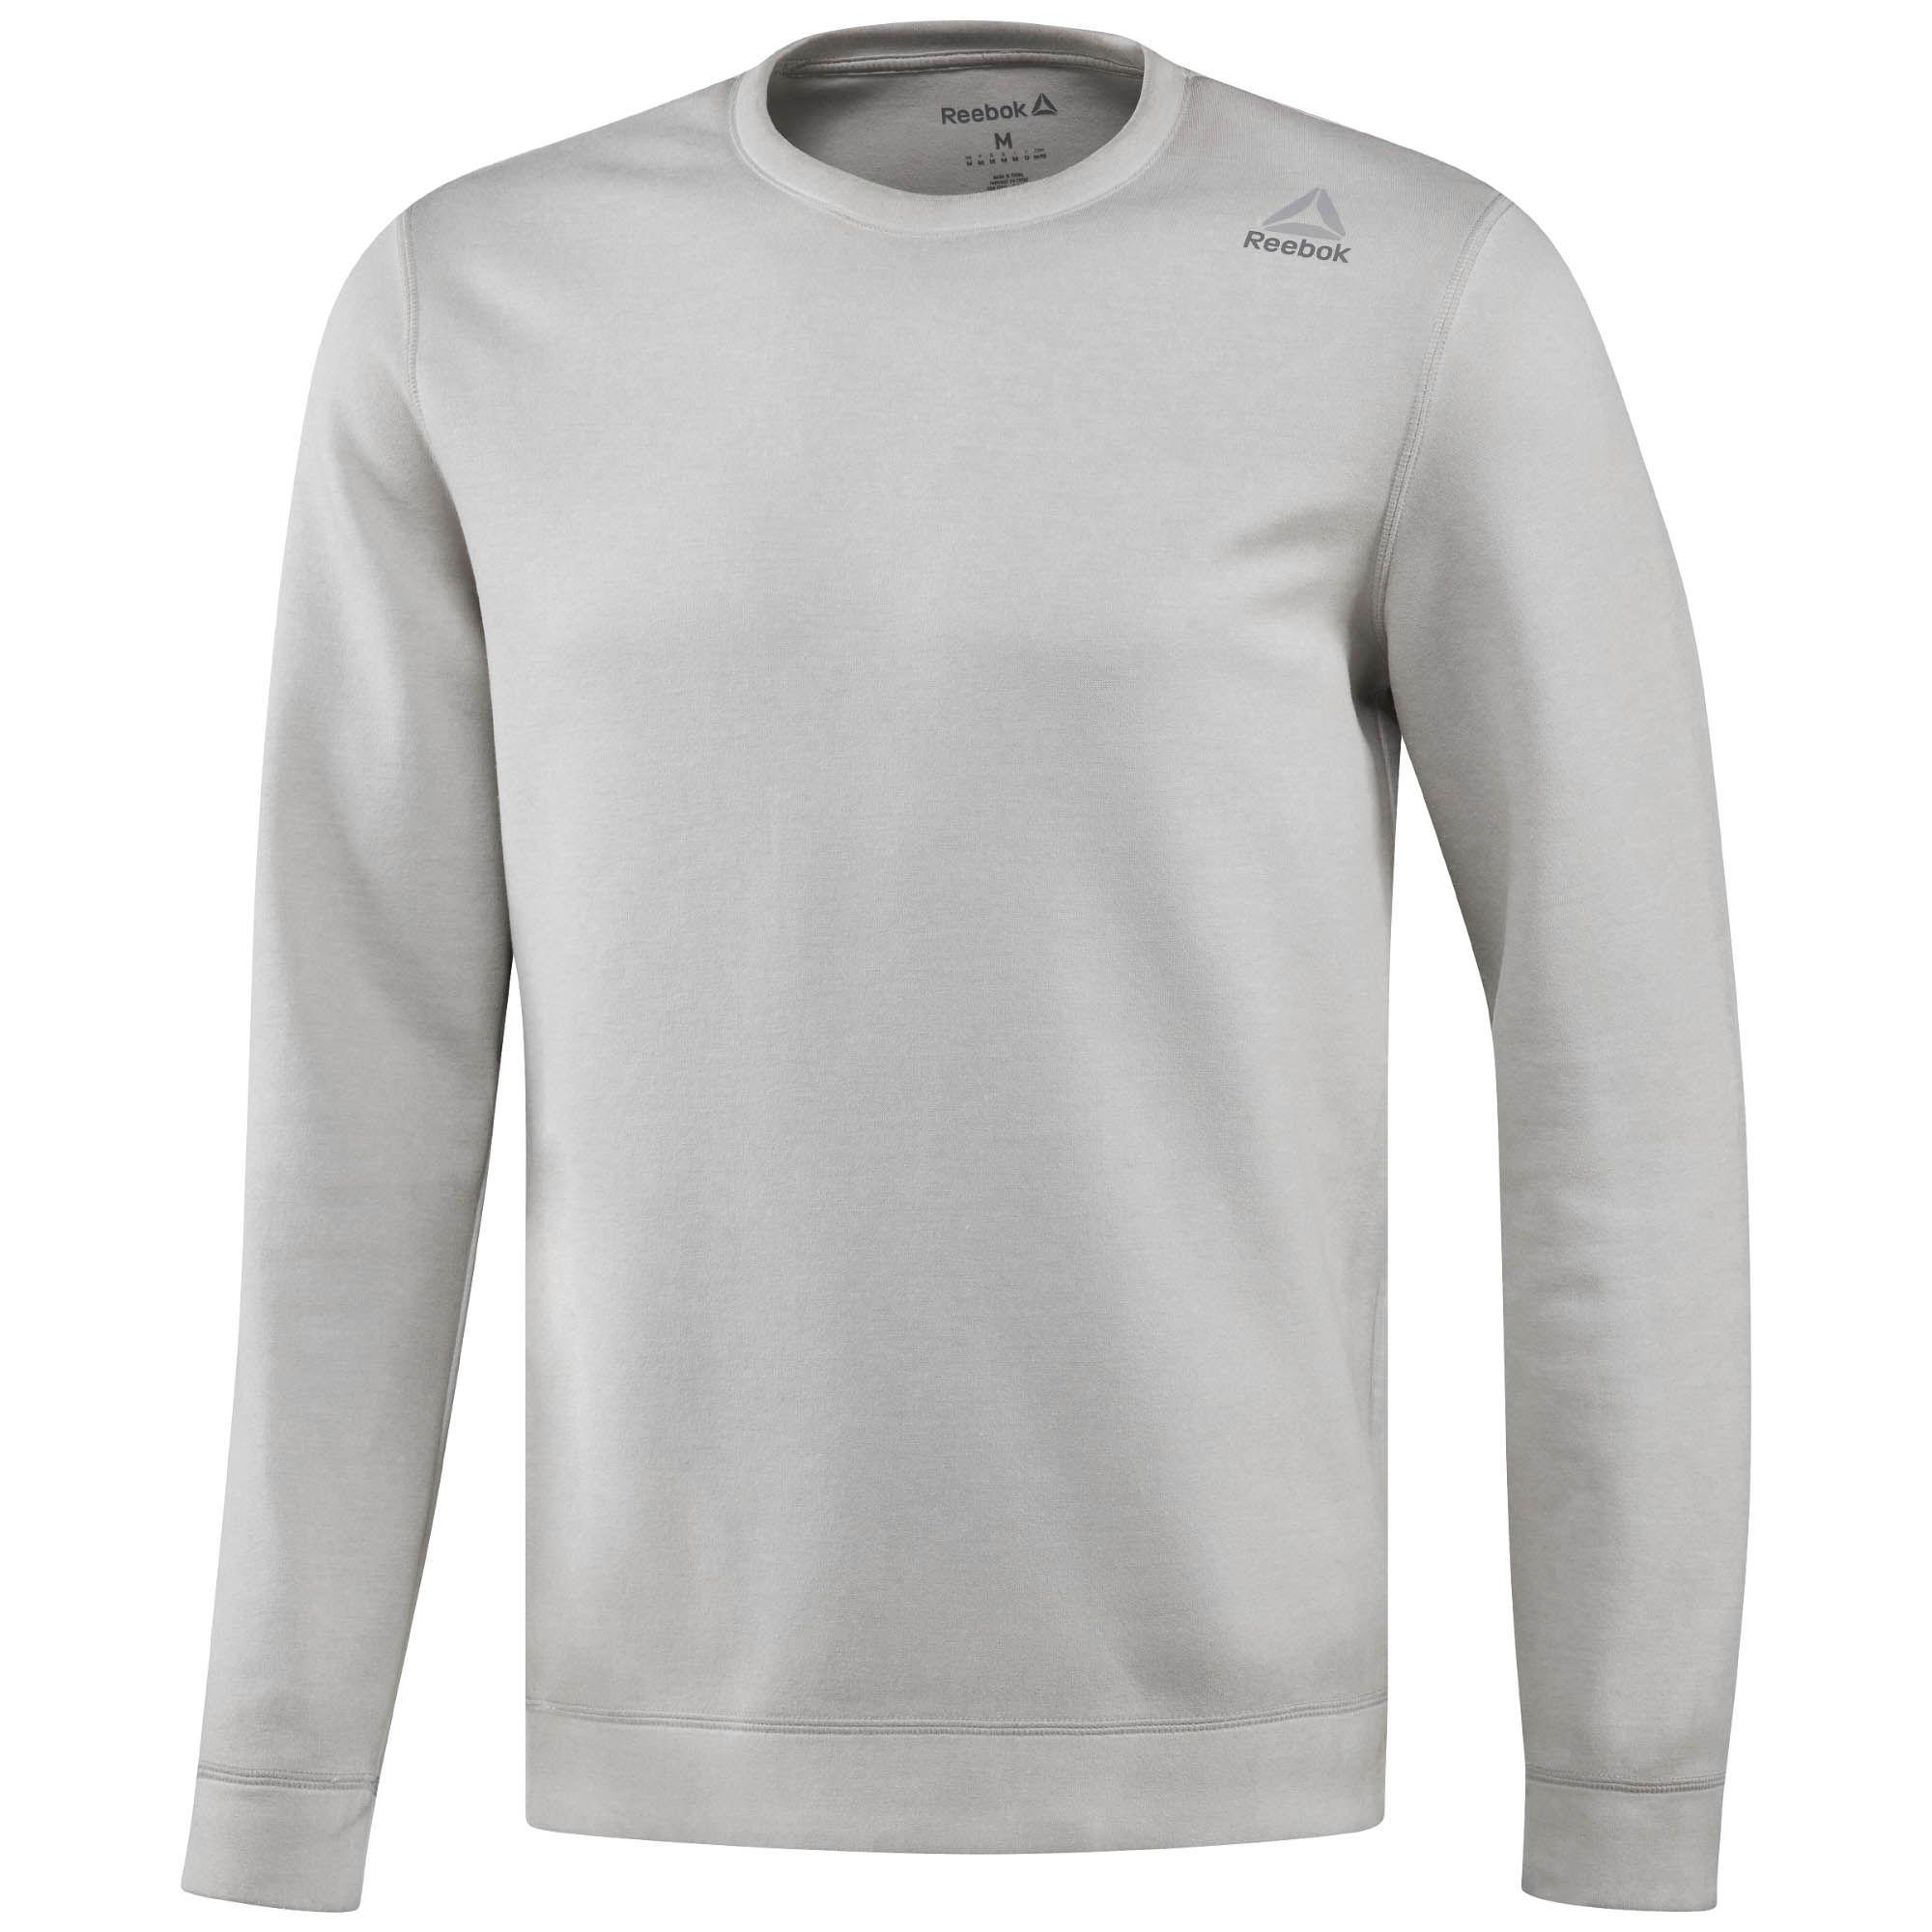 Sweatshirt REEBOK BR9585 sports and entertainment for men men camo striped sweatshirt